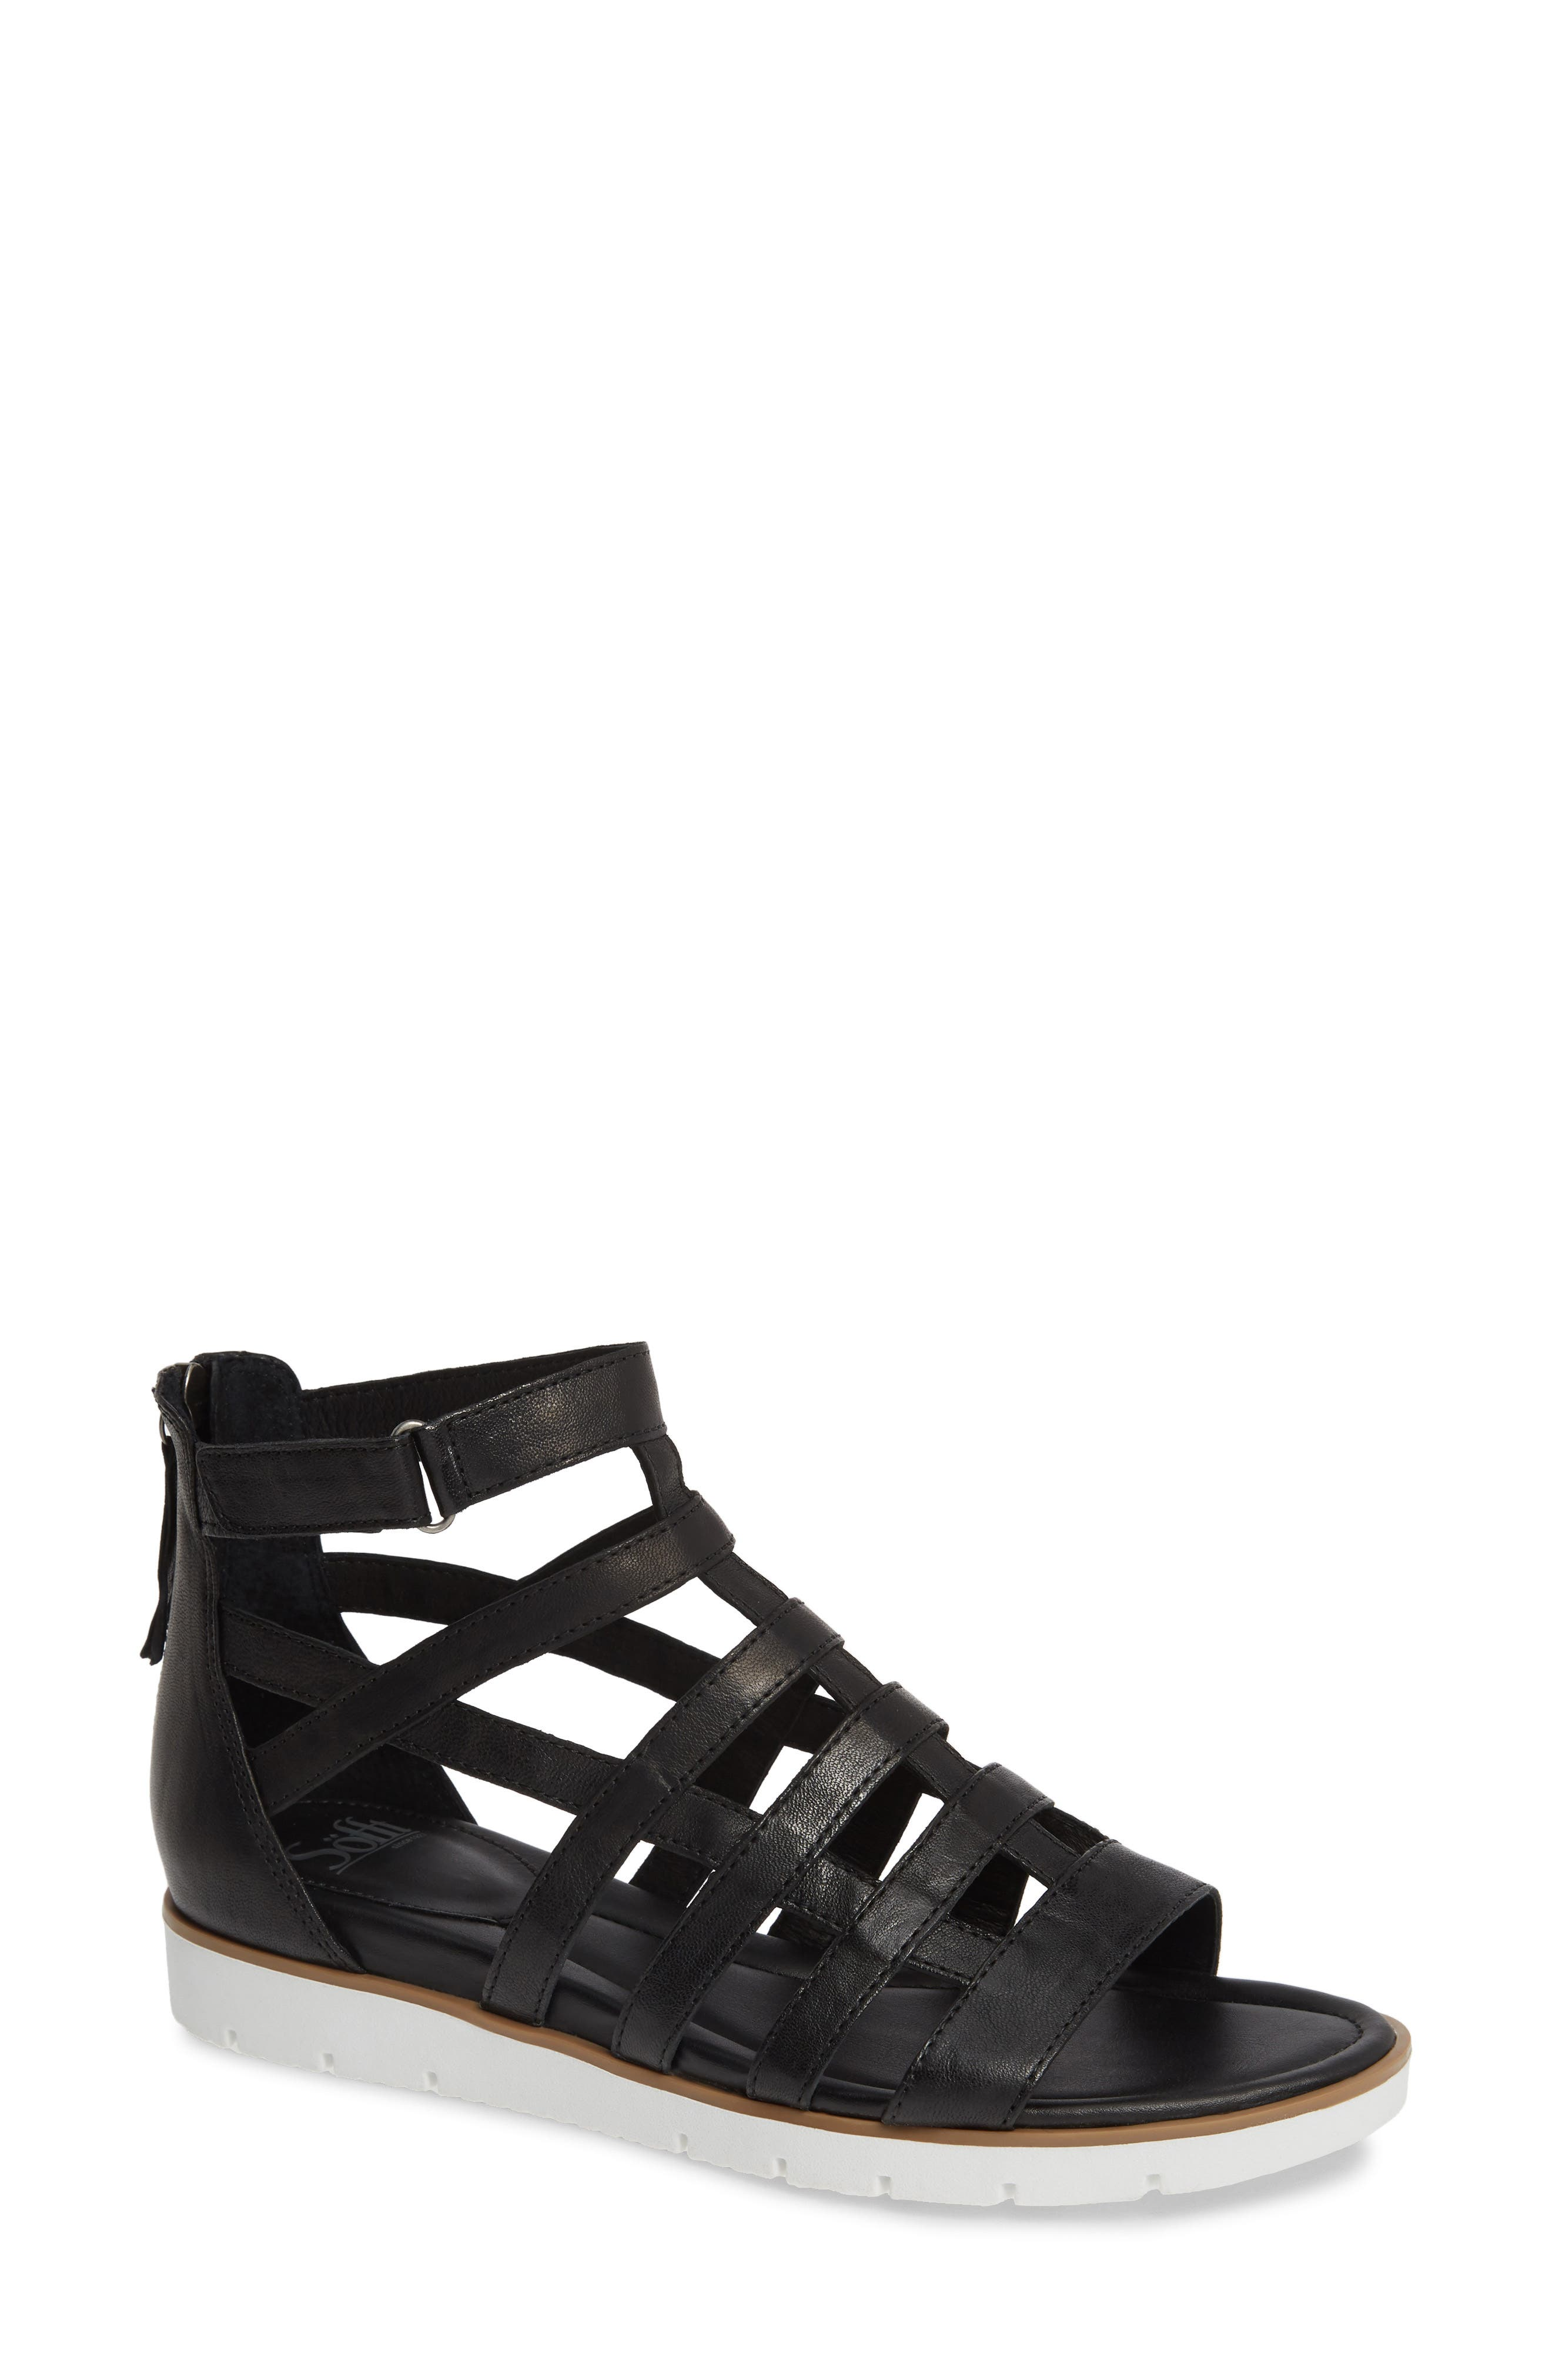 SÖFFT Mahari Gladiator Sandal, Main, color, BLACK LEATHER